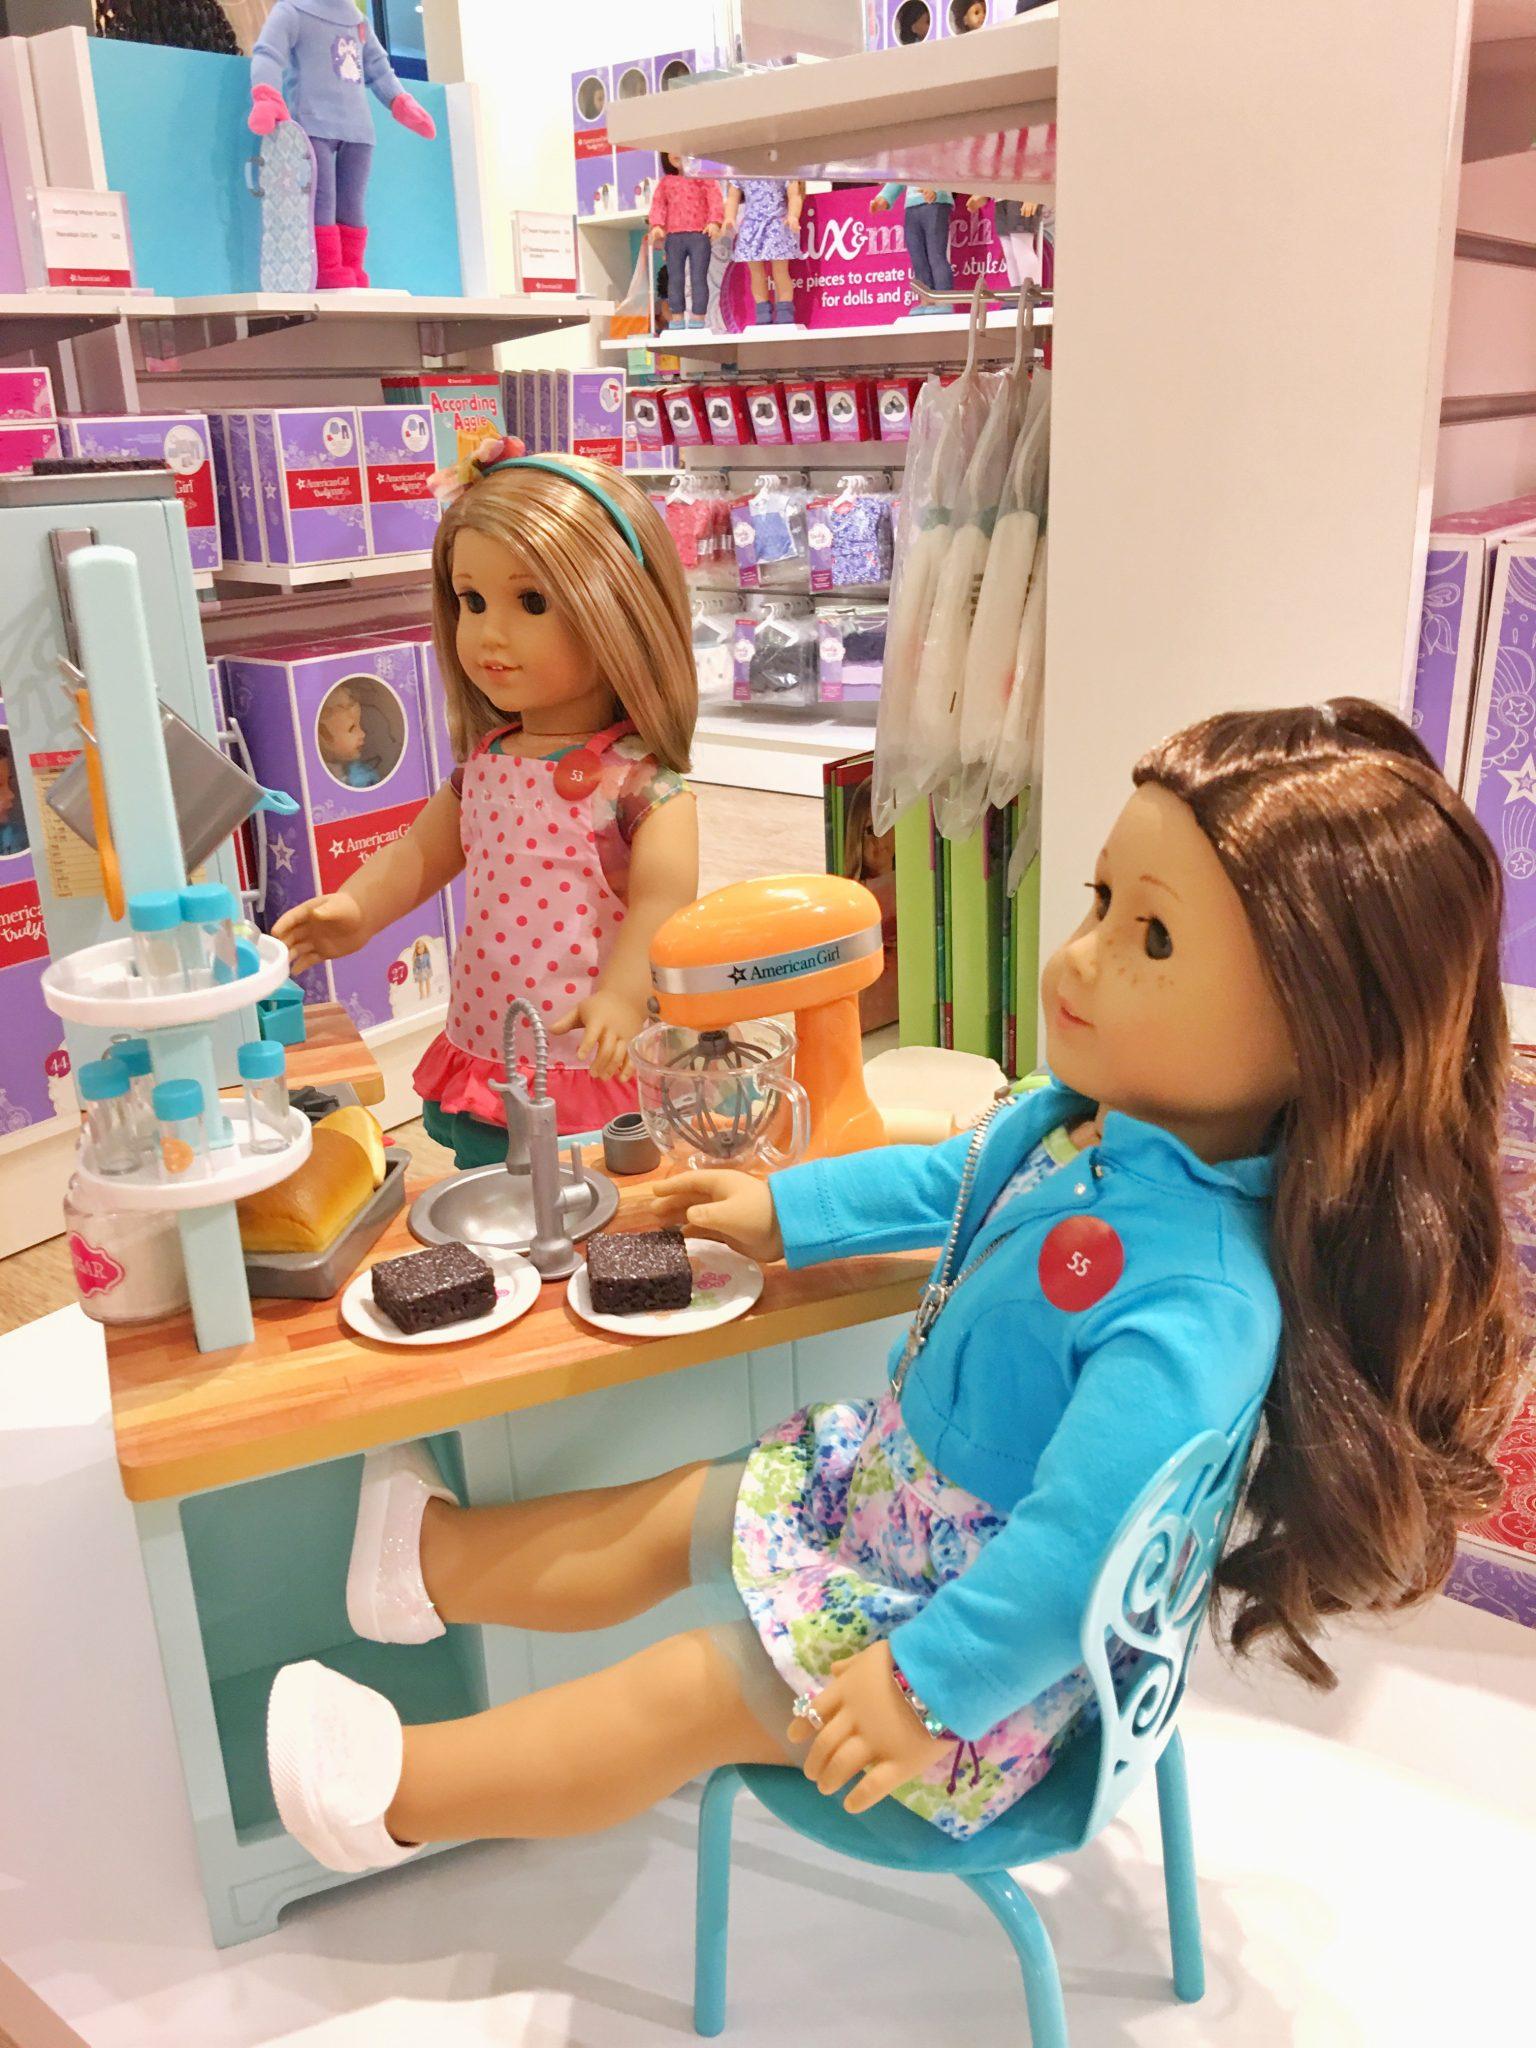 Baking Kitchen Set American Girl at Washington Square Mall